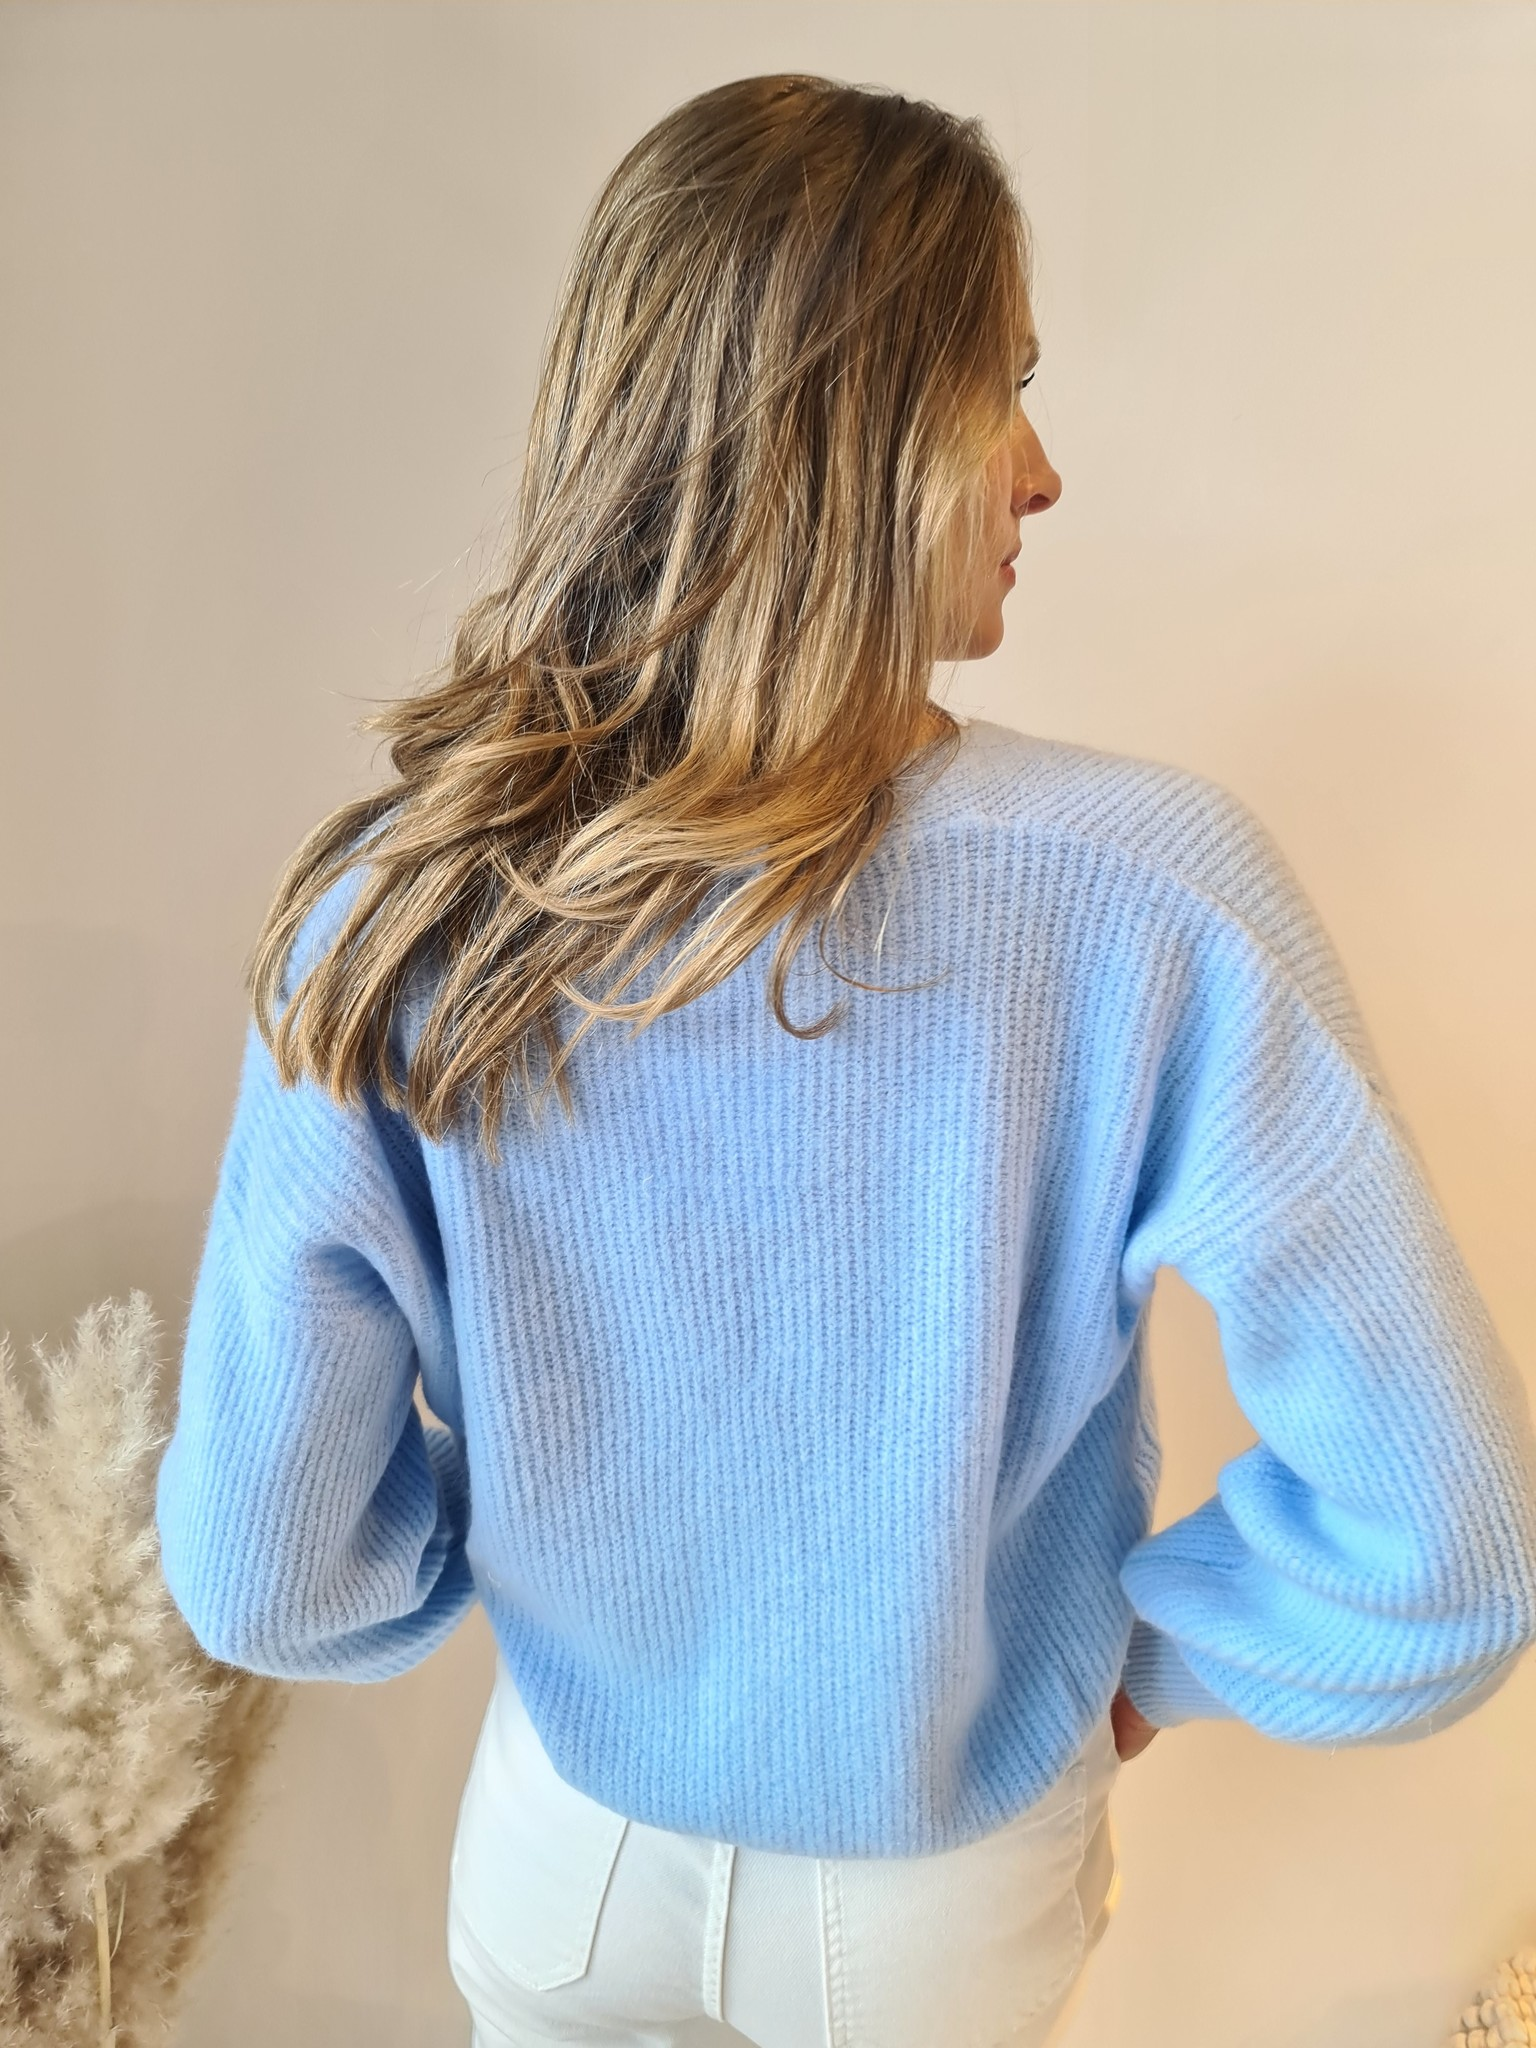 TRENDY gilet bleu ciel-3